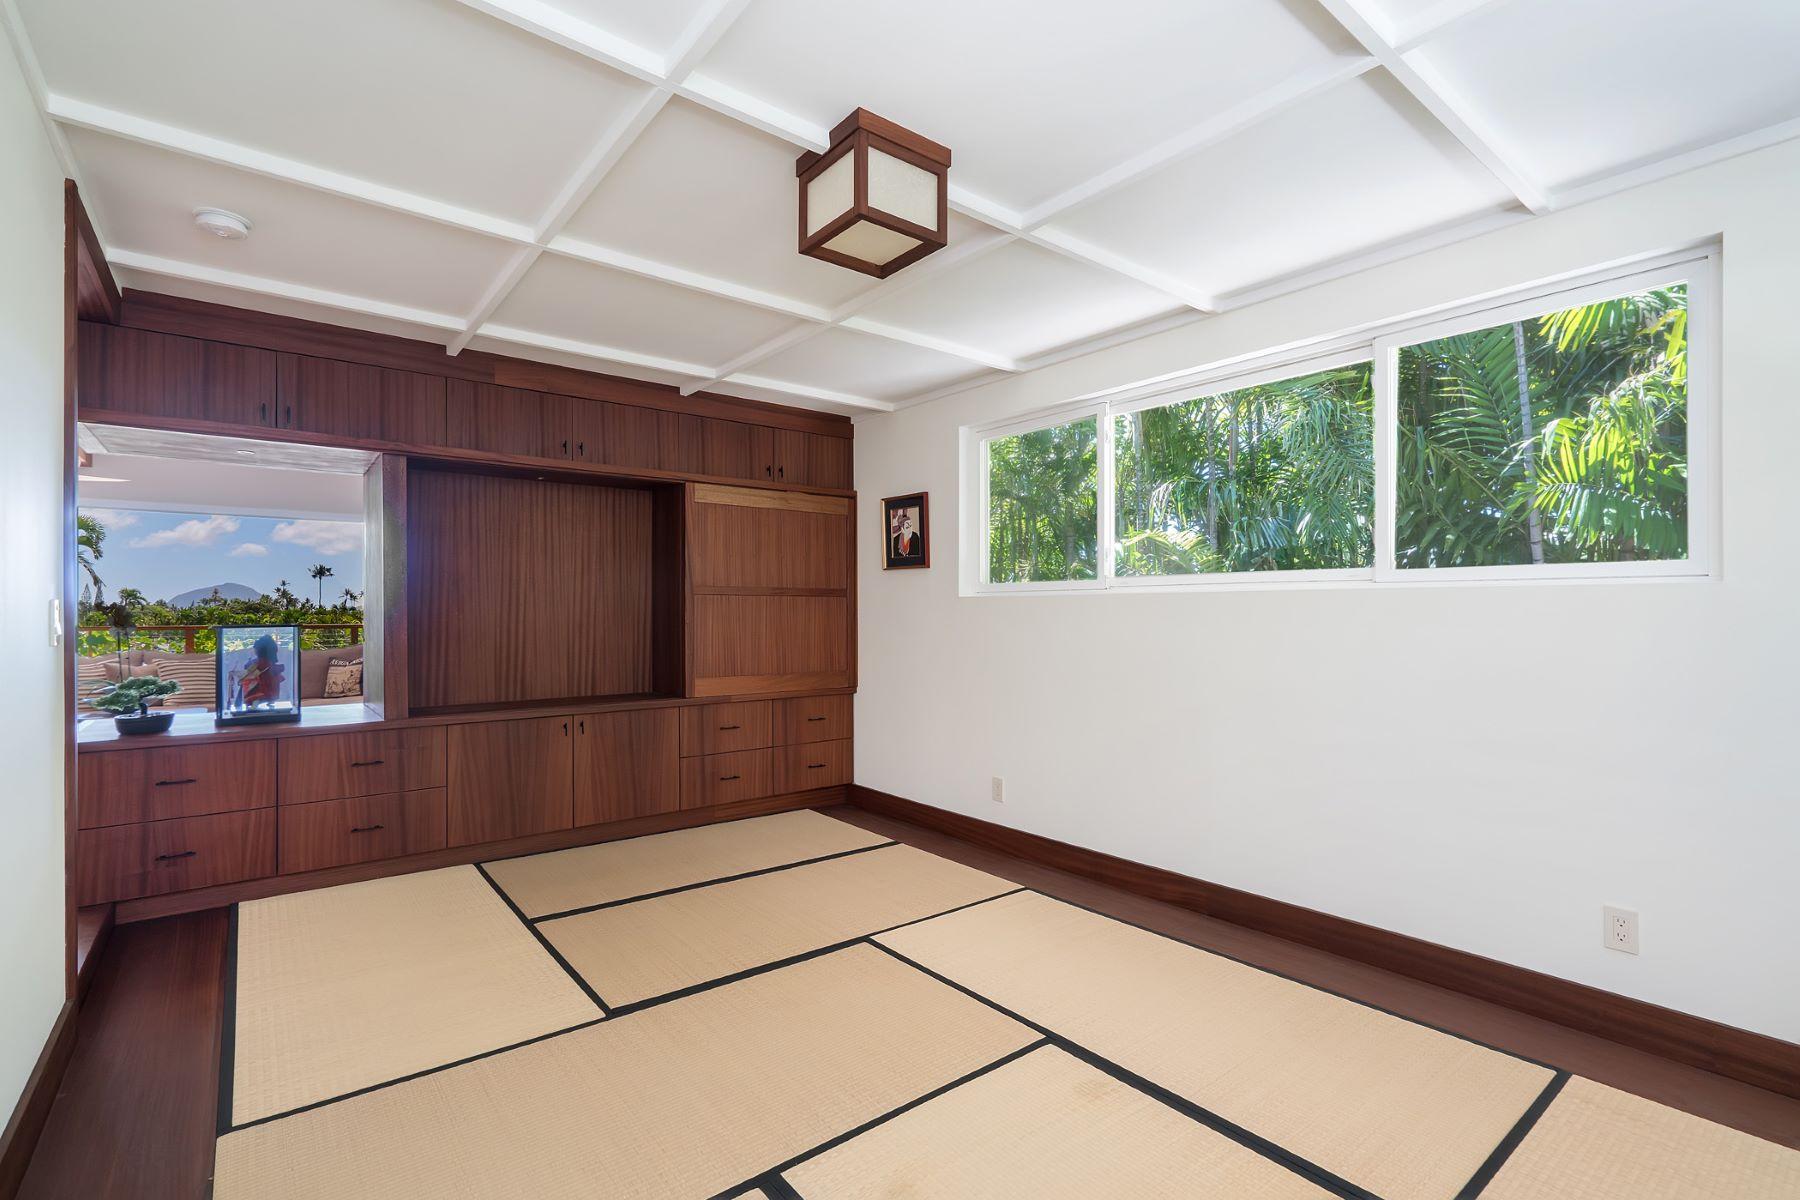 Additional photo for property listing at An Island Oasis 4316 Aukai Avenue Honolulu, Hawaii 96816 United States